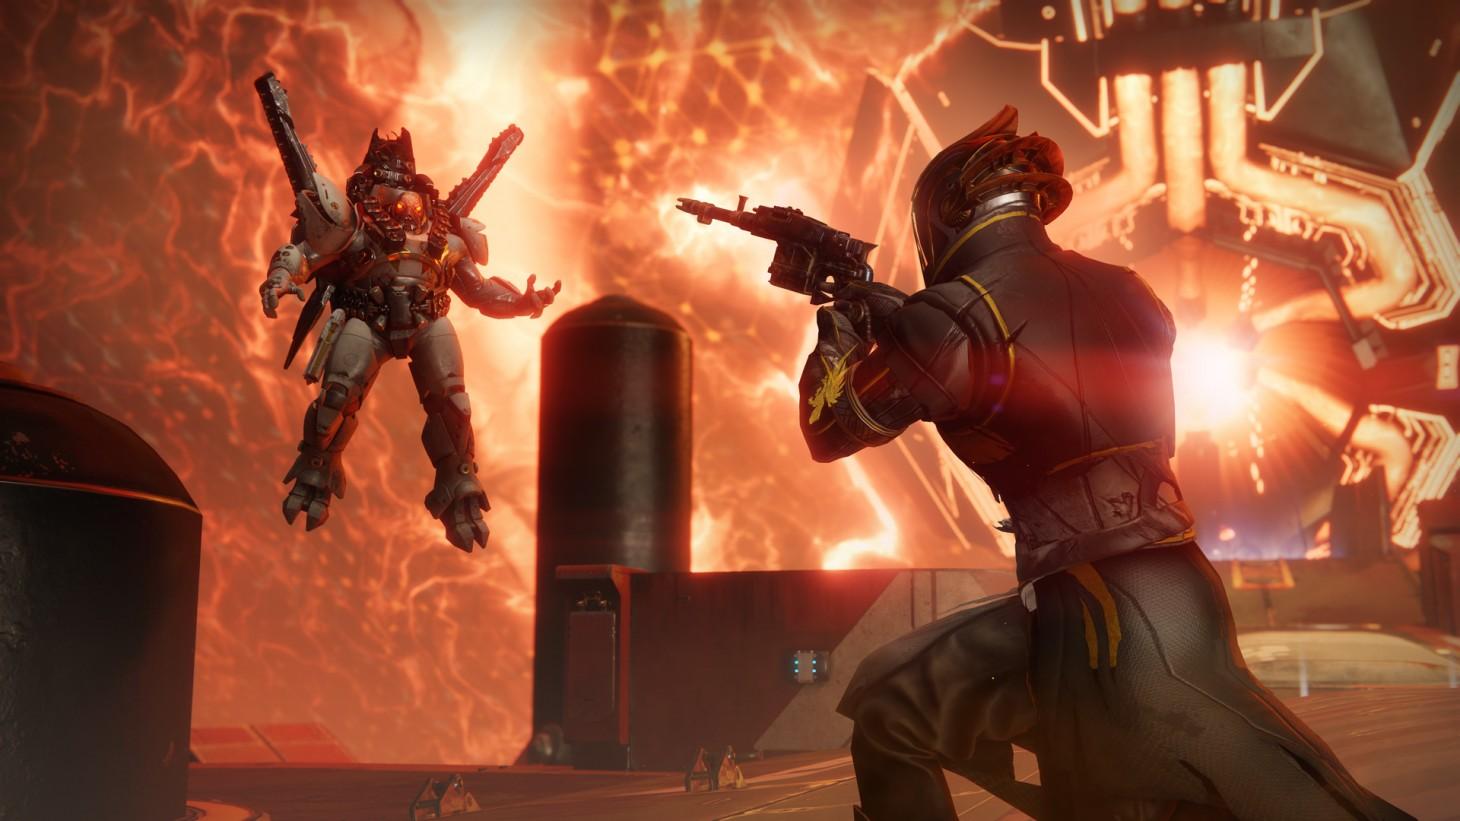 Destiny 2, God Of War III Remastered Headline September's